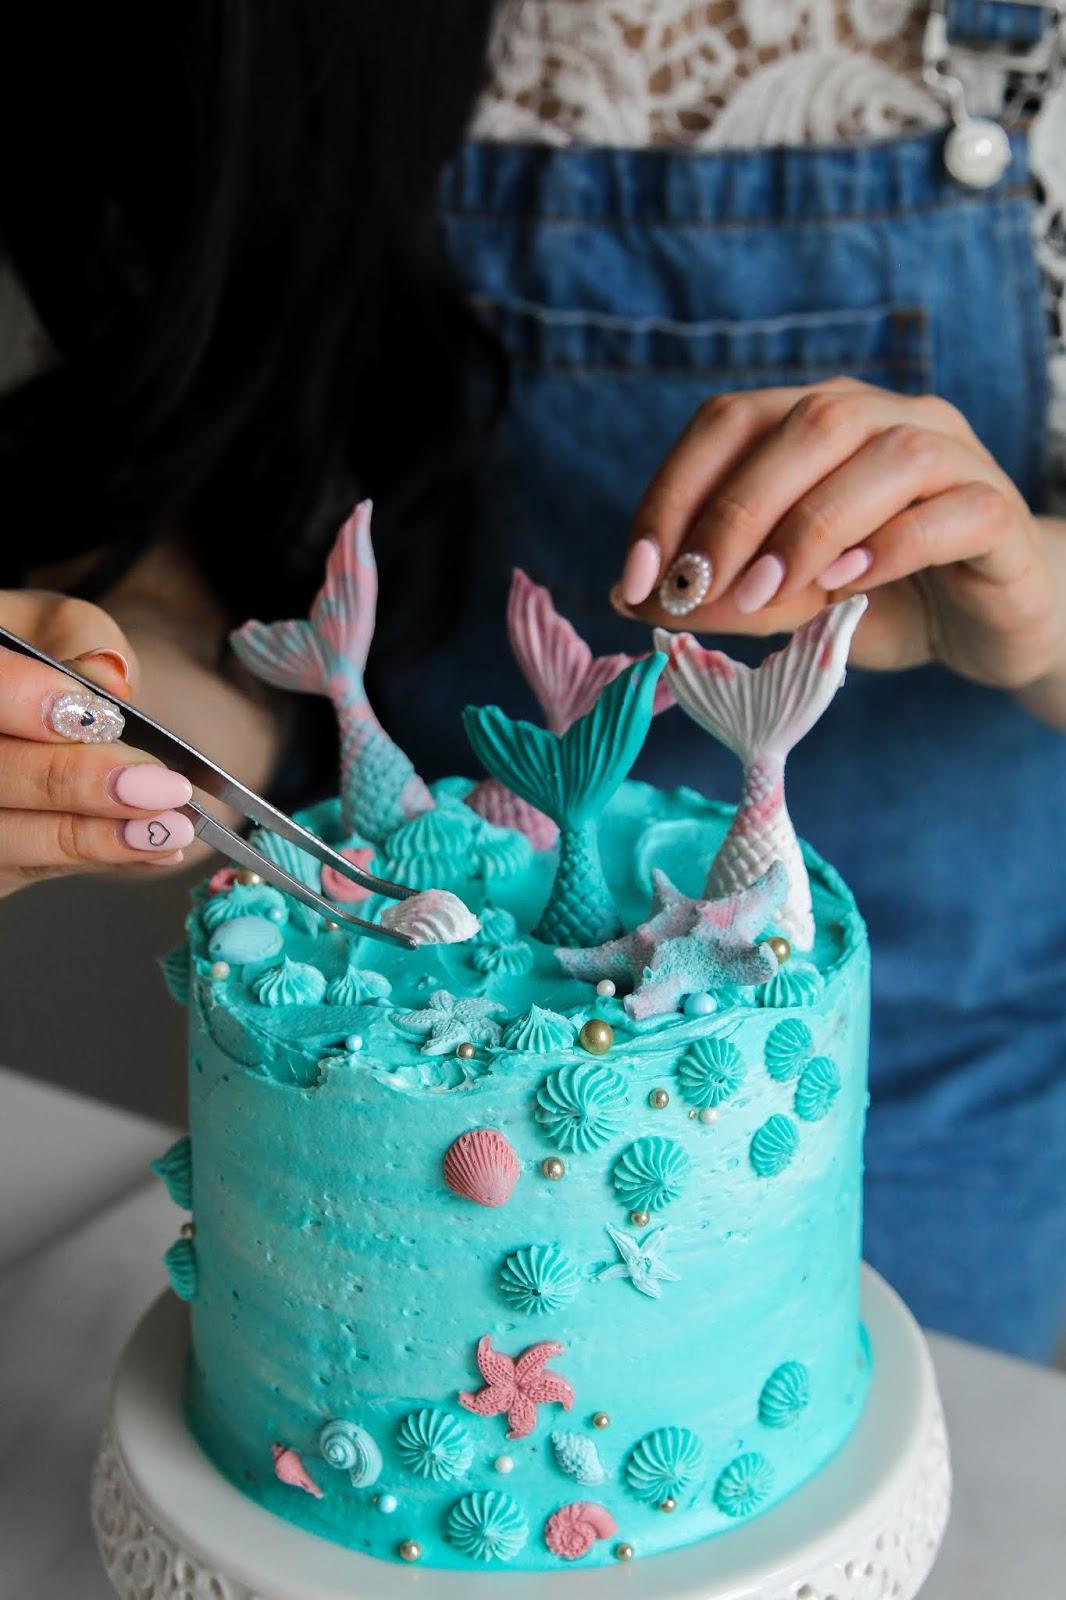 Admirable Mermaid Oreo Funfetti Birthday Cake Constellation Inspiration Personalised Birthday Cards Veneteletsinfo